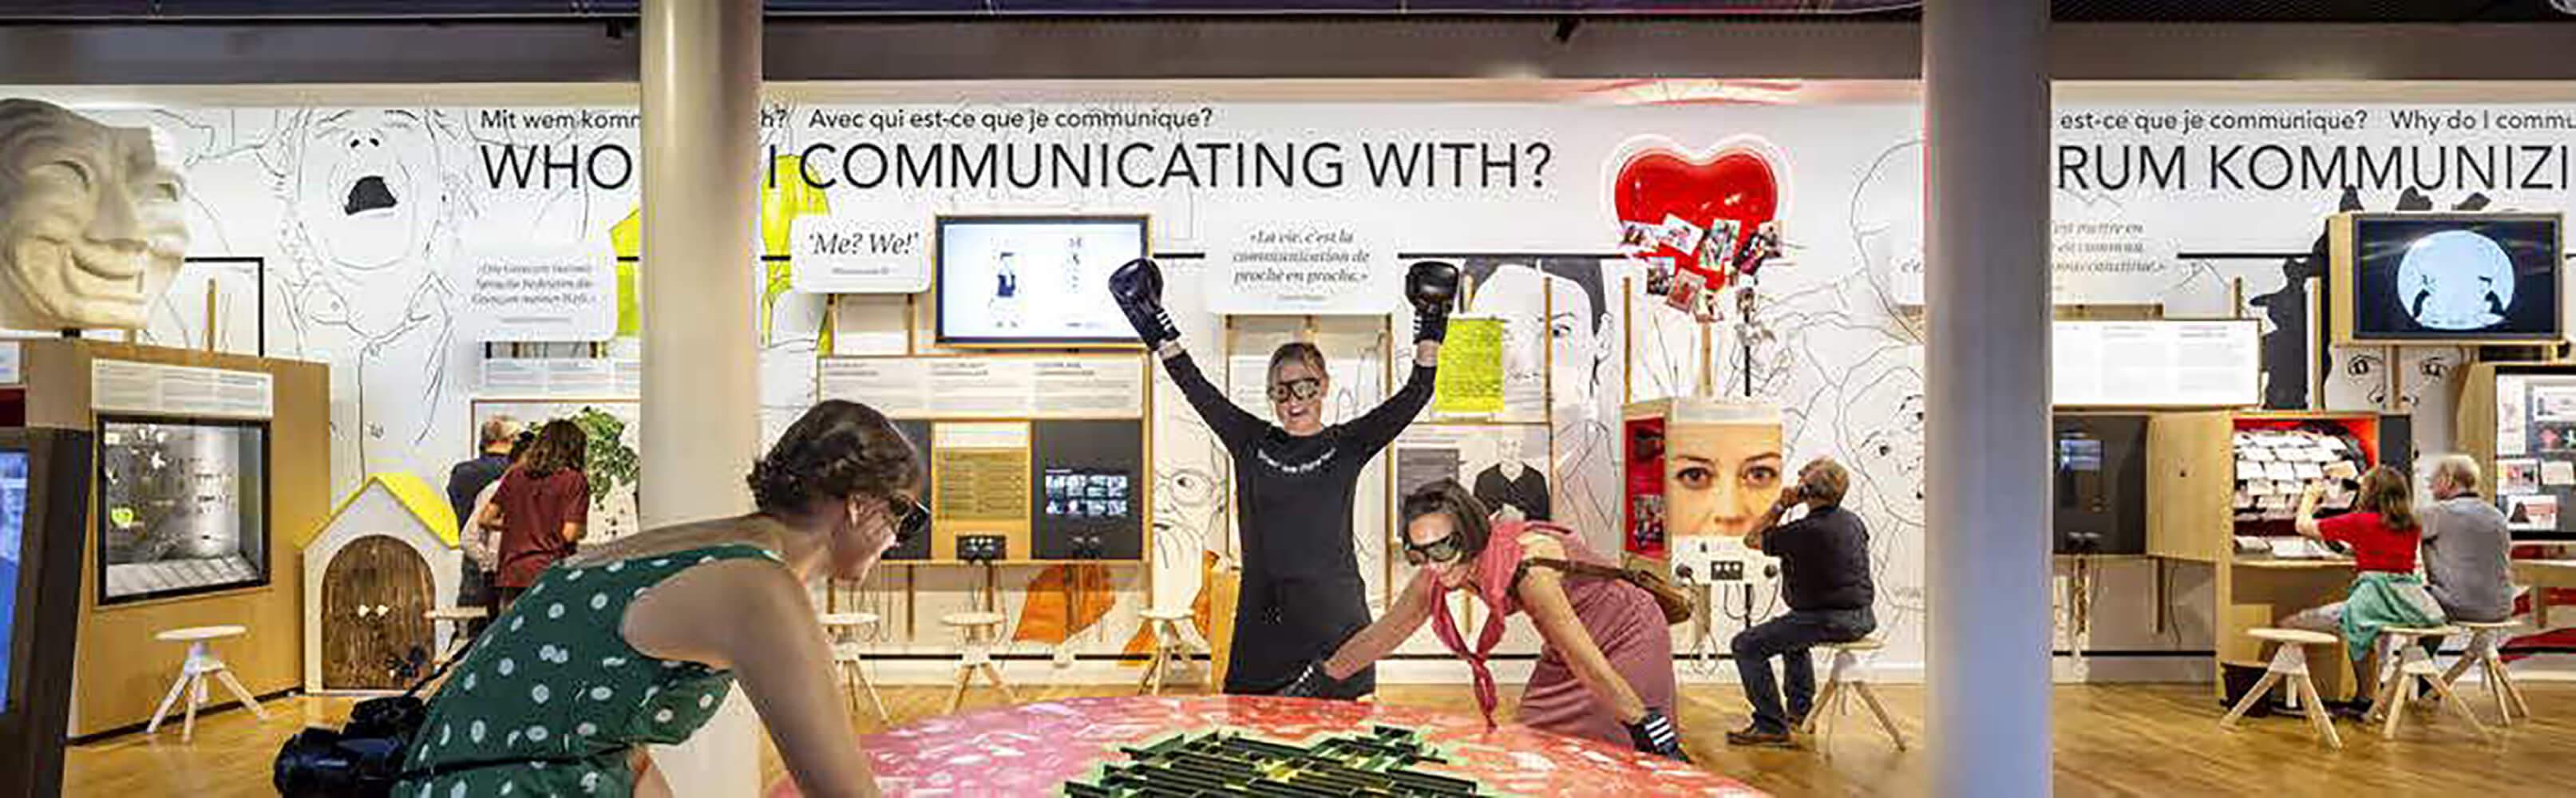 Museum für Kommunikation Bern - Ratatösks Kinderwelt 1